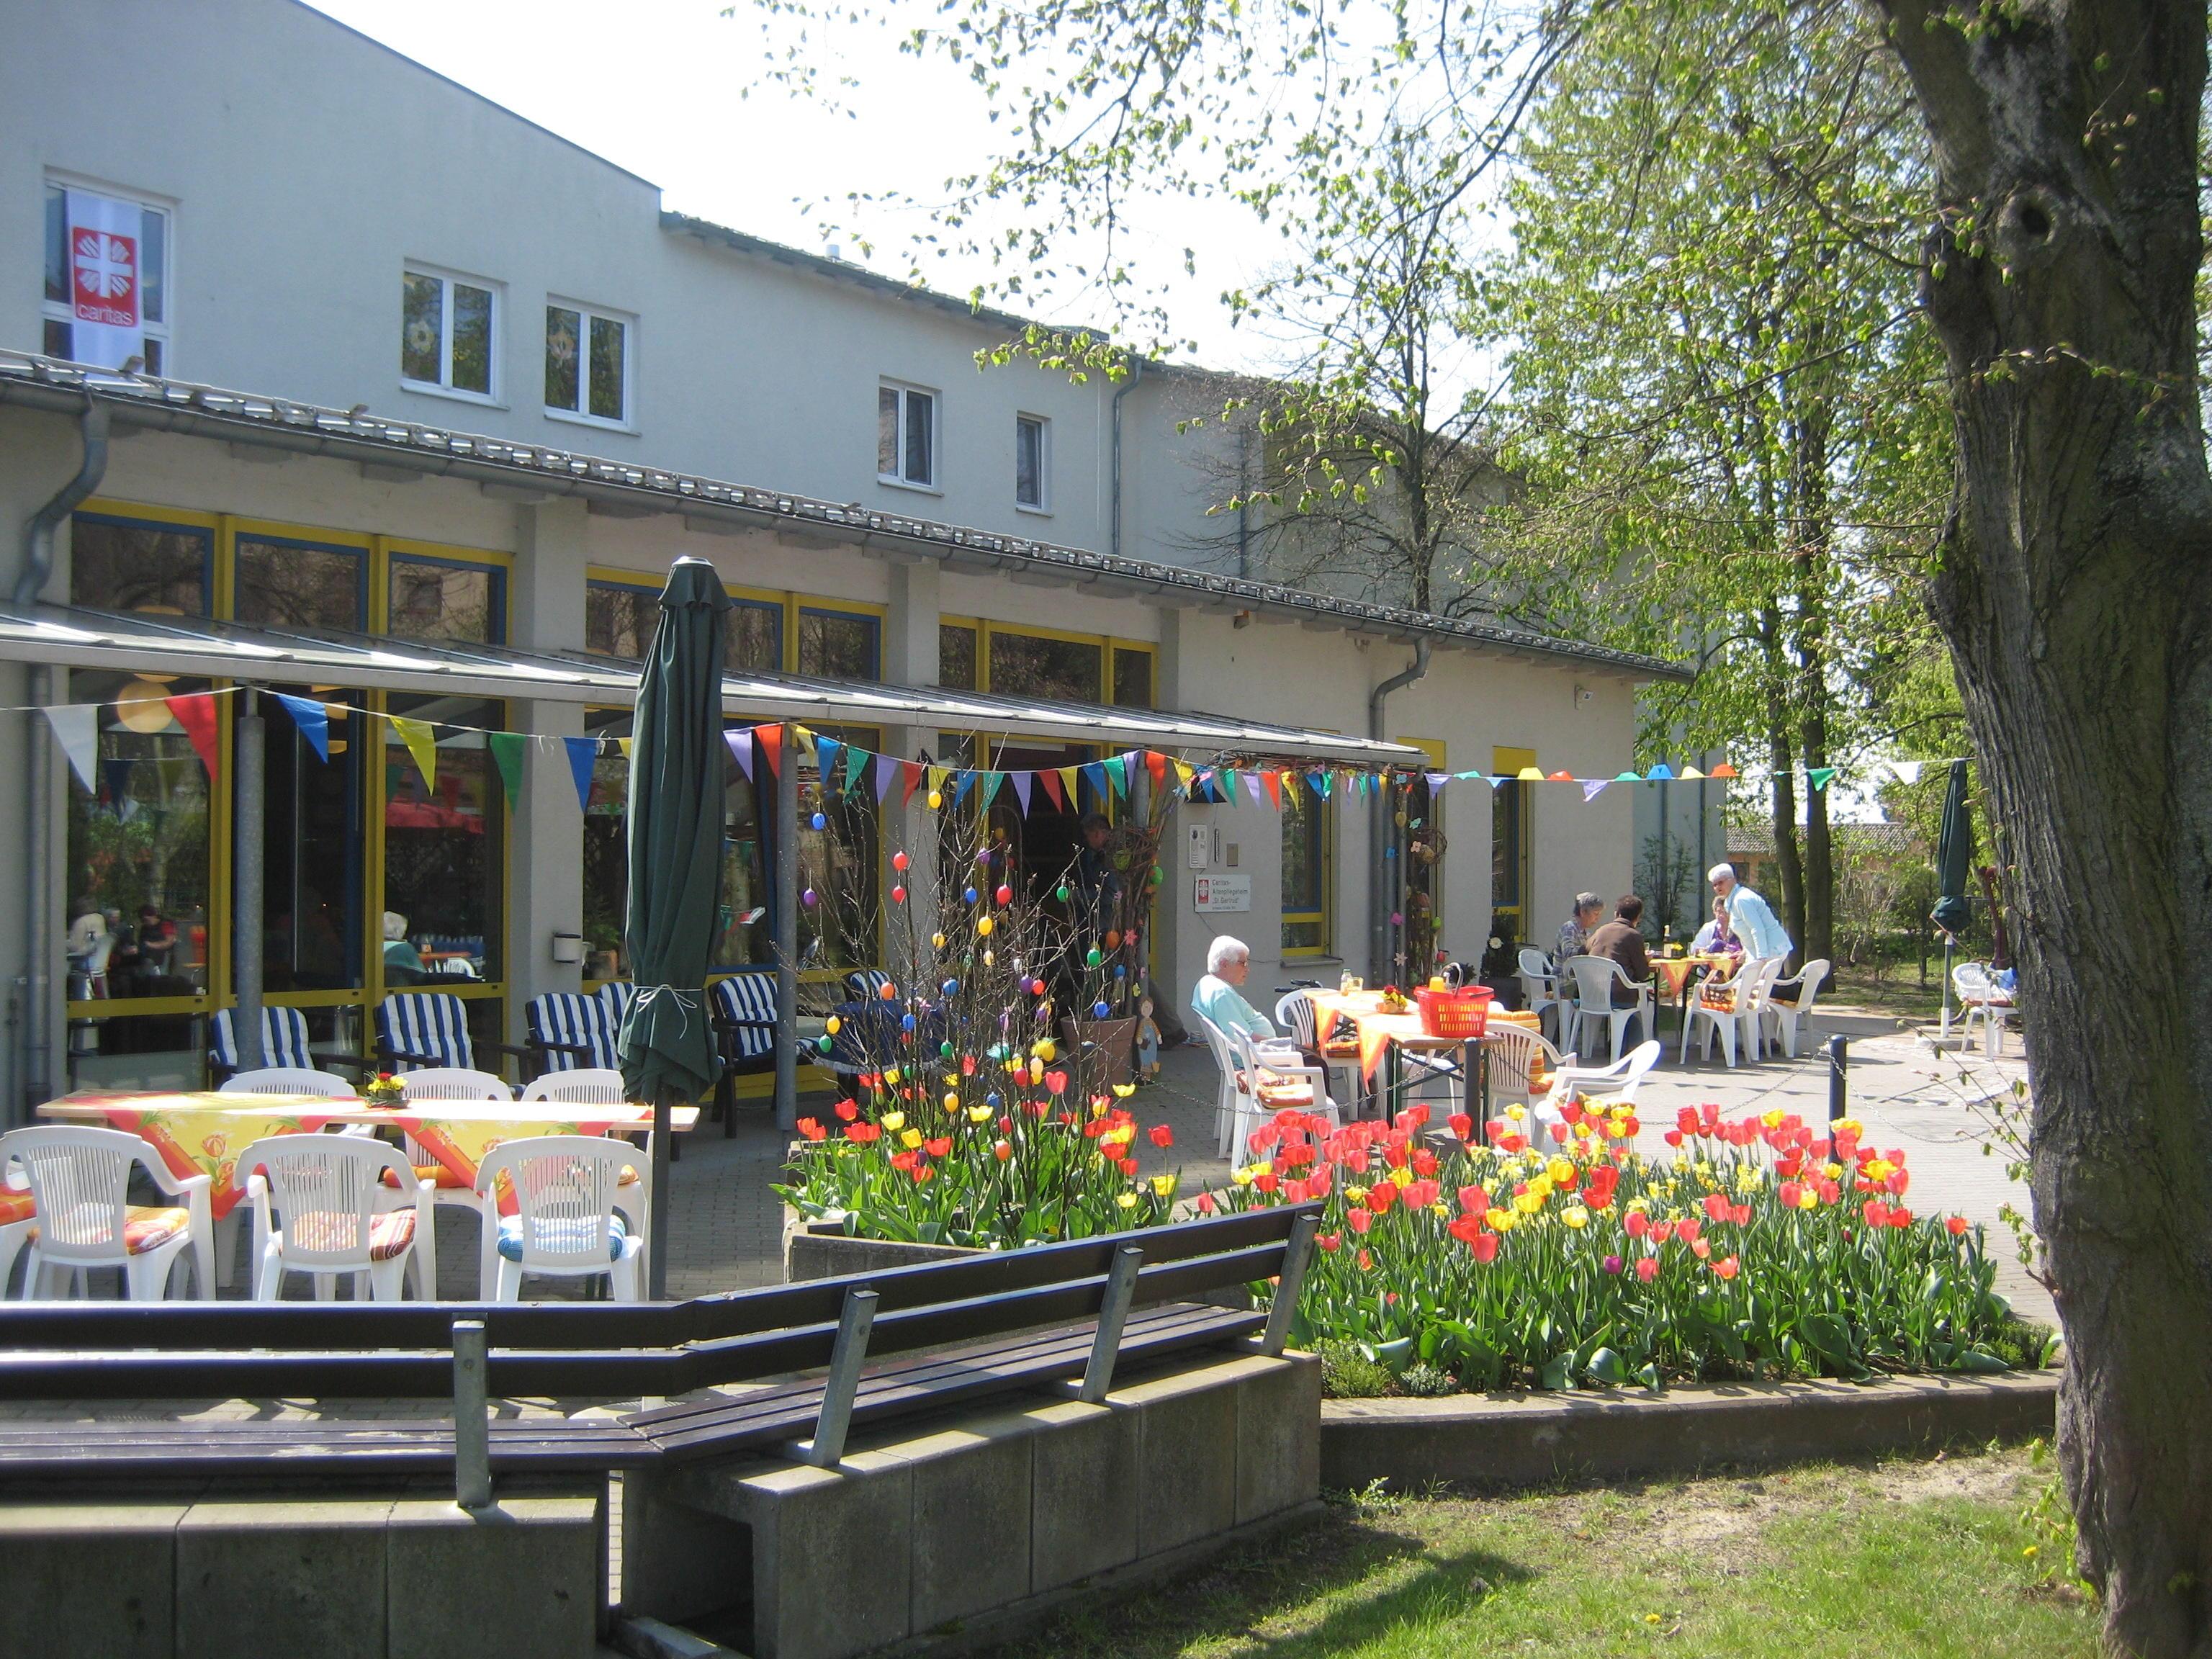 Caritas-Altenpflegeheim St. Gertrud